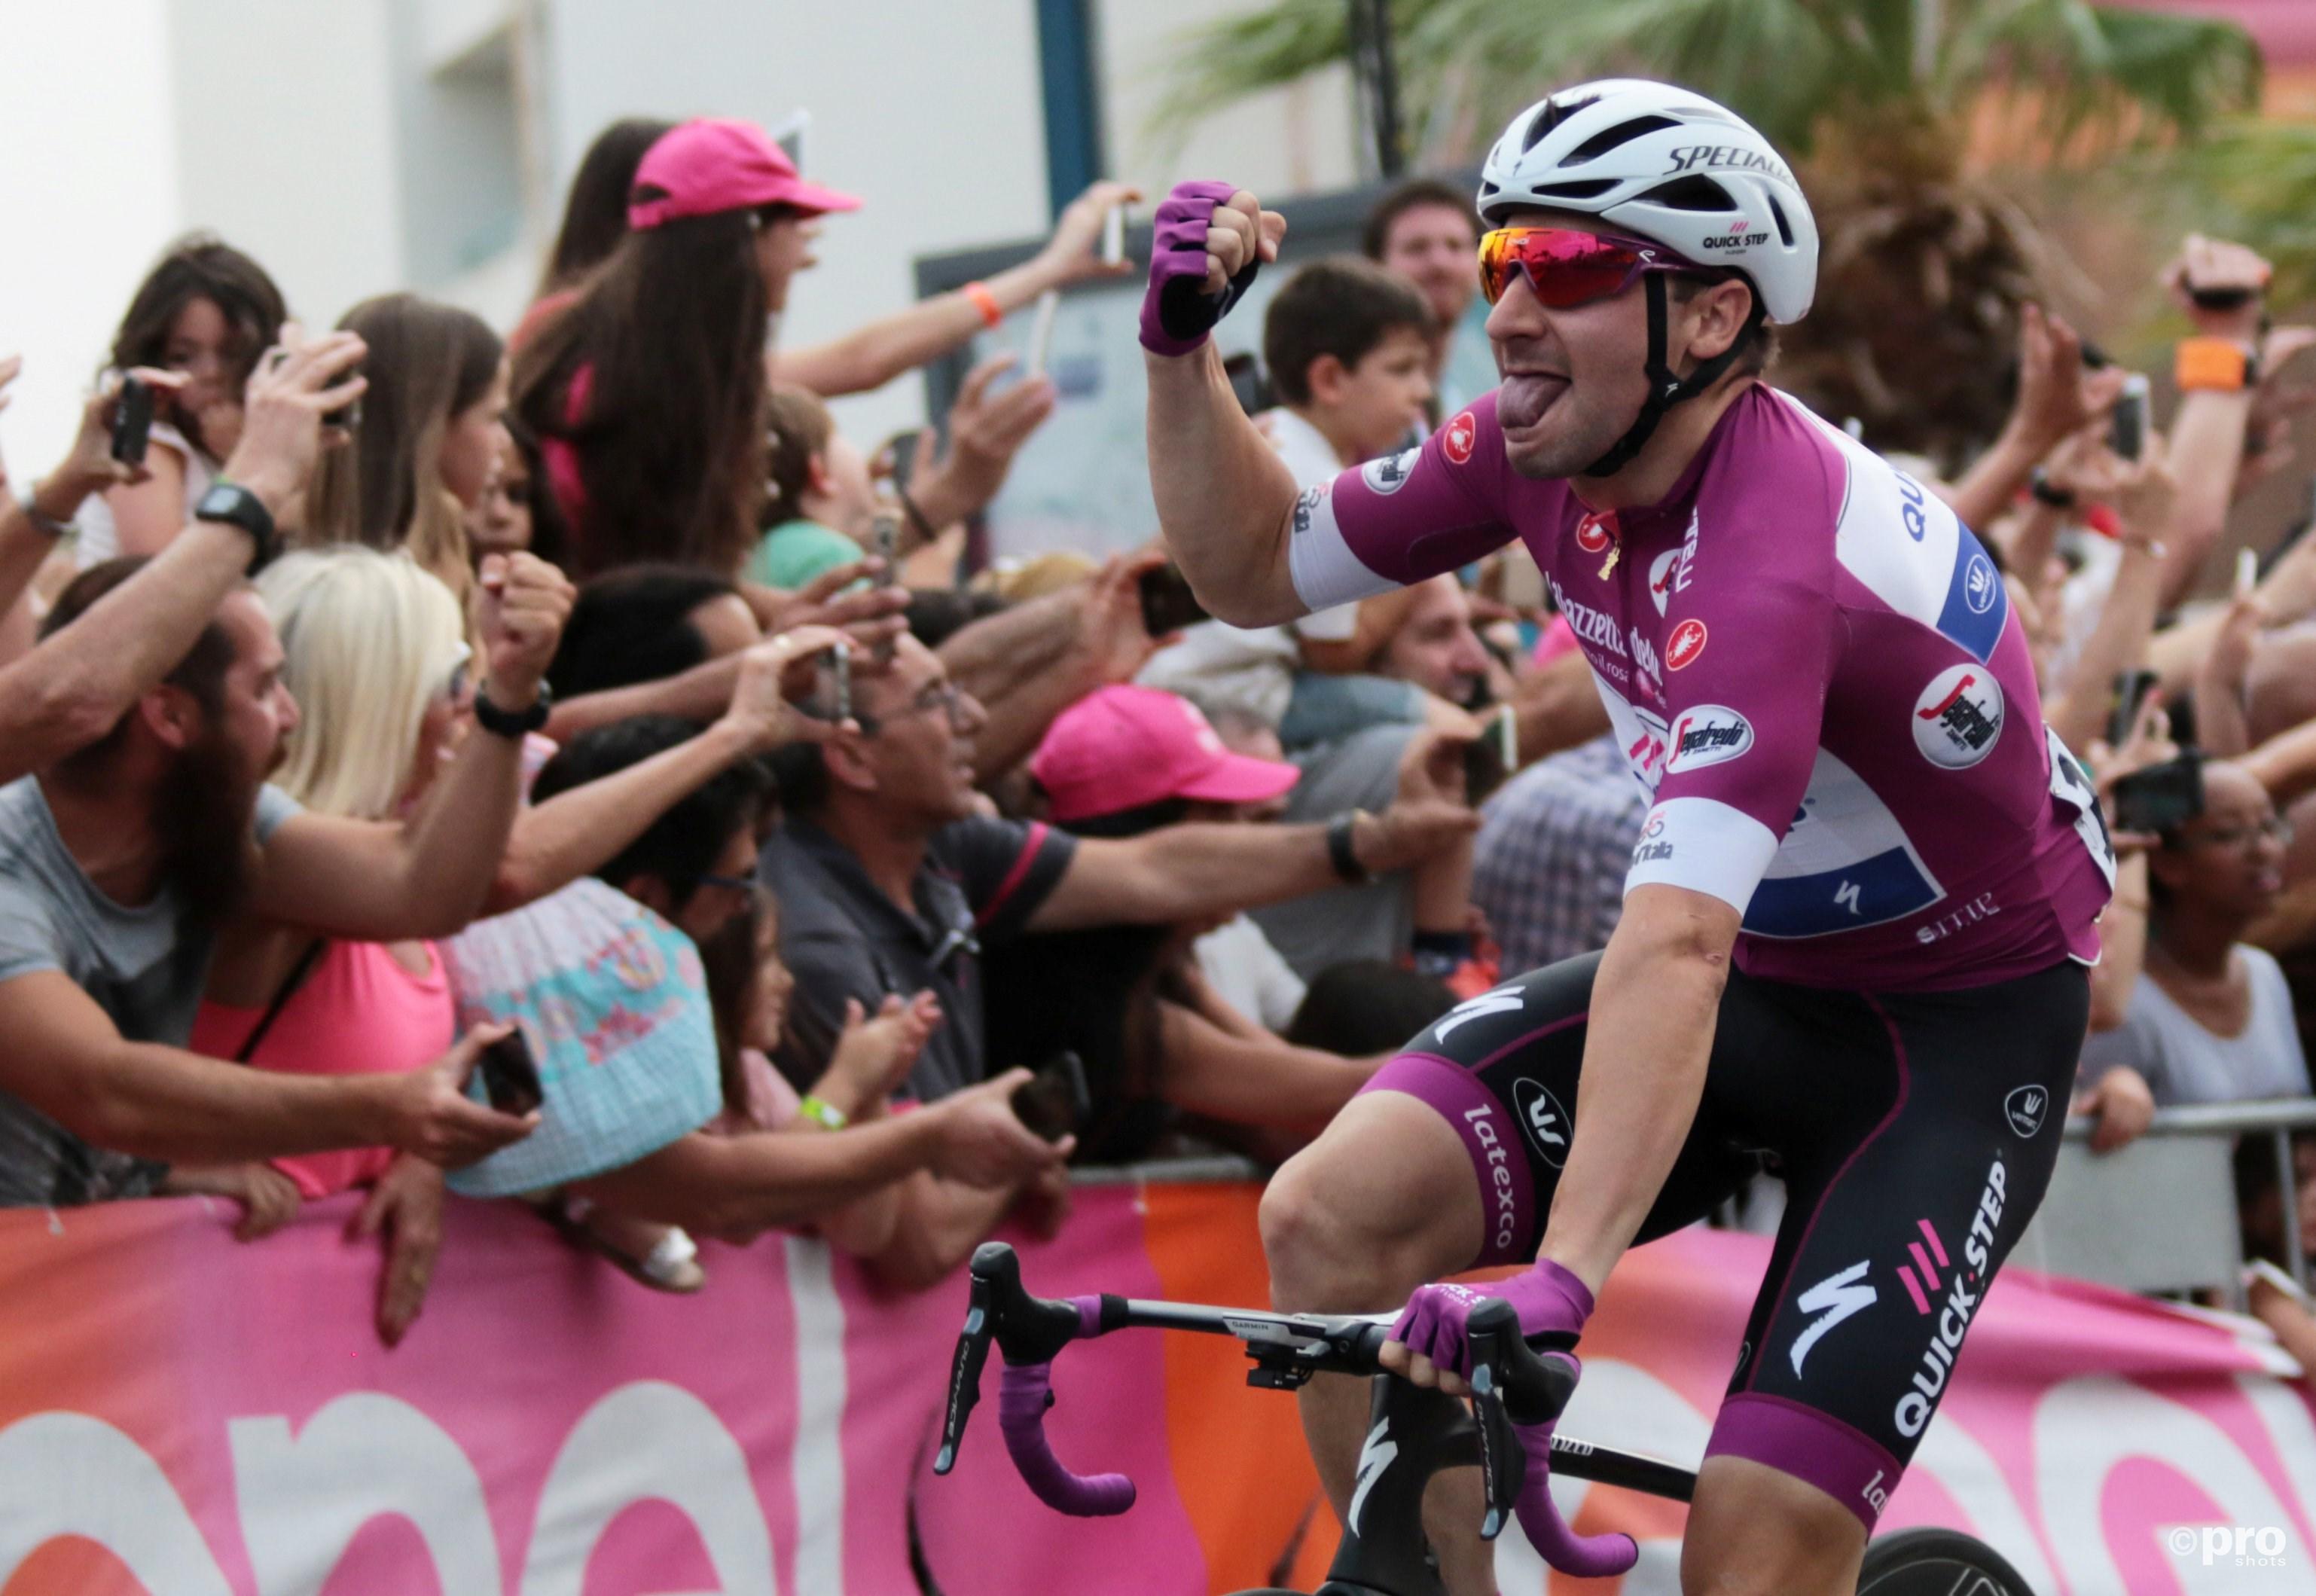 Viviani na winst in derde etappe Giro d'Italia (Pro Shots / Action Images)